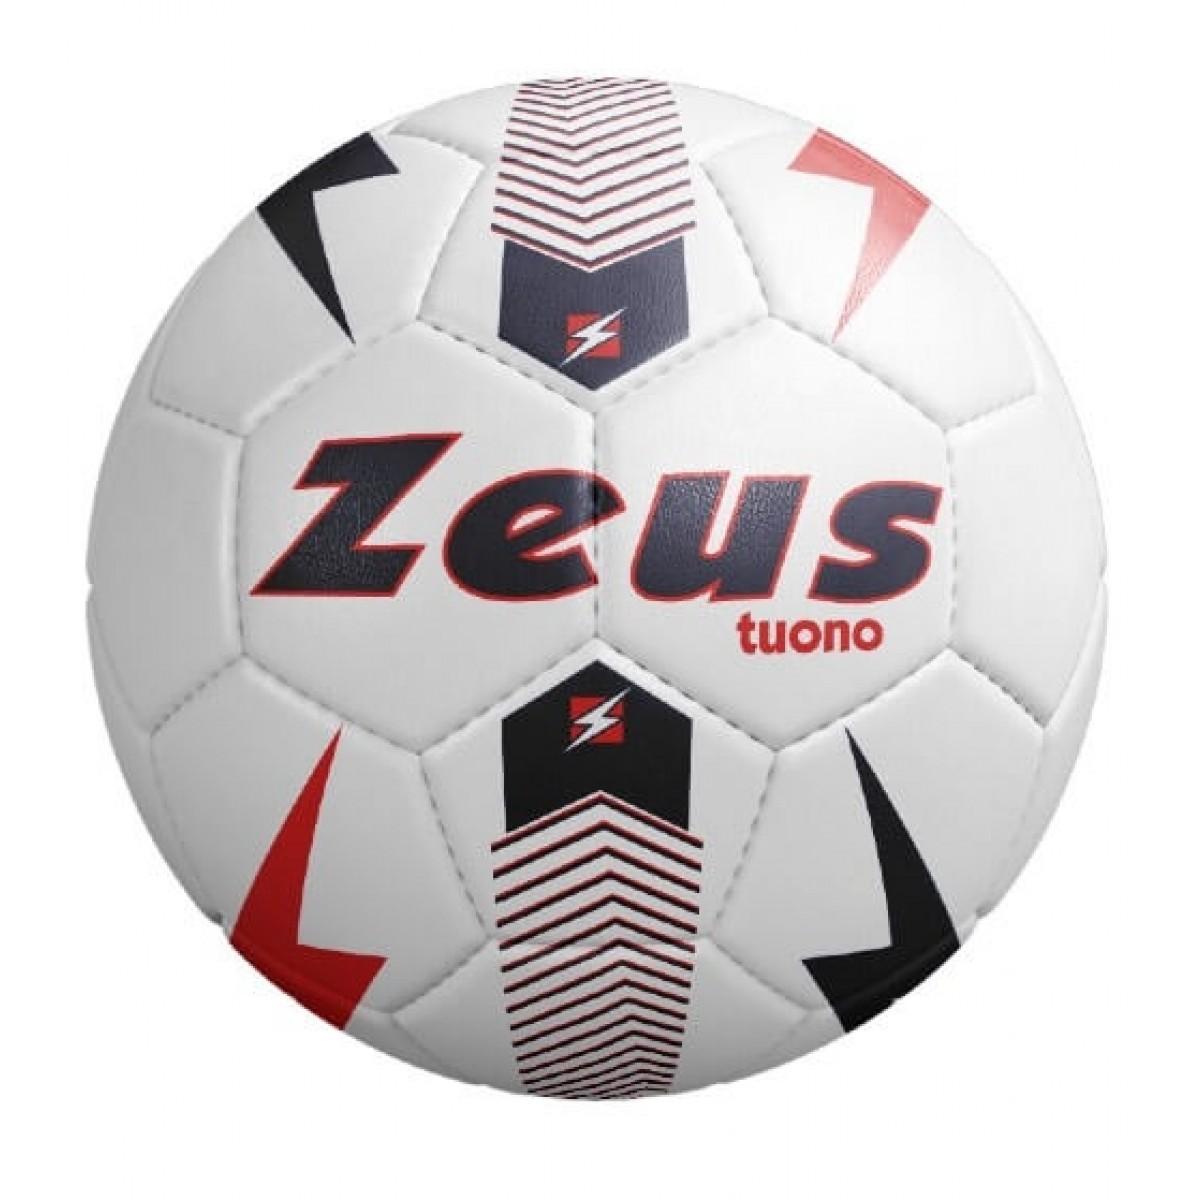 Zeus Tuono fodbold hvid rød